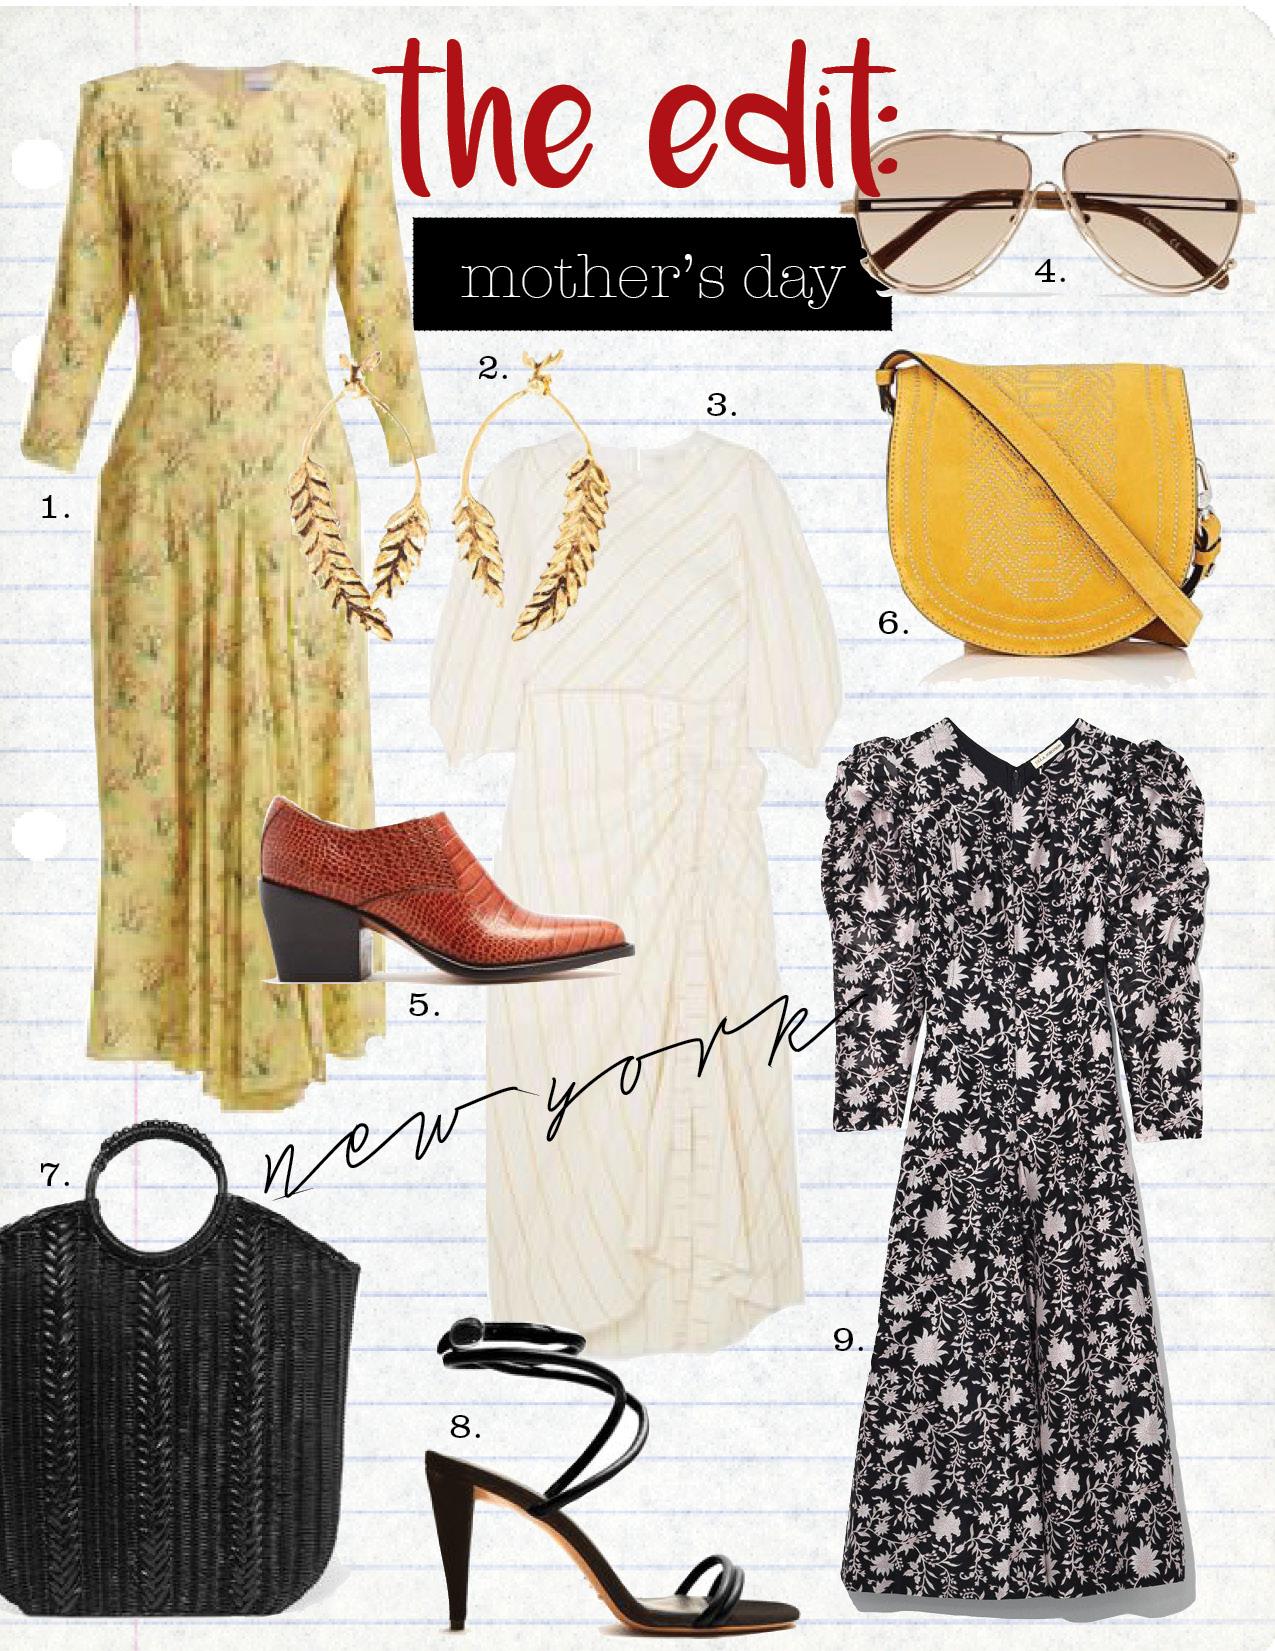 1. raey bracelet sleeve acid tree-print silk dress, $540,  matchesfashion.com  2. aurelie bidermann wheat gold-plated earrings, $320,  net-a-porter.com  3. maje ruched striped gauze midi dress, $570,  net-a-porter.com  4. chloe isidora aviator-style gold-tone sunglasses, $400,  net-a-porter.com  5. chloe rylee leather ankle boots, $880,  matchesfashion.com  6. altuzarra ghianda small suede saddle bag, $1495,  barneys.com  7. ulla johnson rona wicker tote, $390,  net-a-porter.com  8. isabel marant abigua tie-ankle leather sandals, $695,  matchesfashion.com  9. ulla johnson fontaine floral cotton-silk dress, $575,  barneys.com